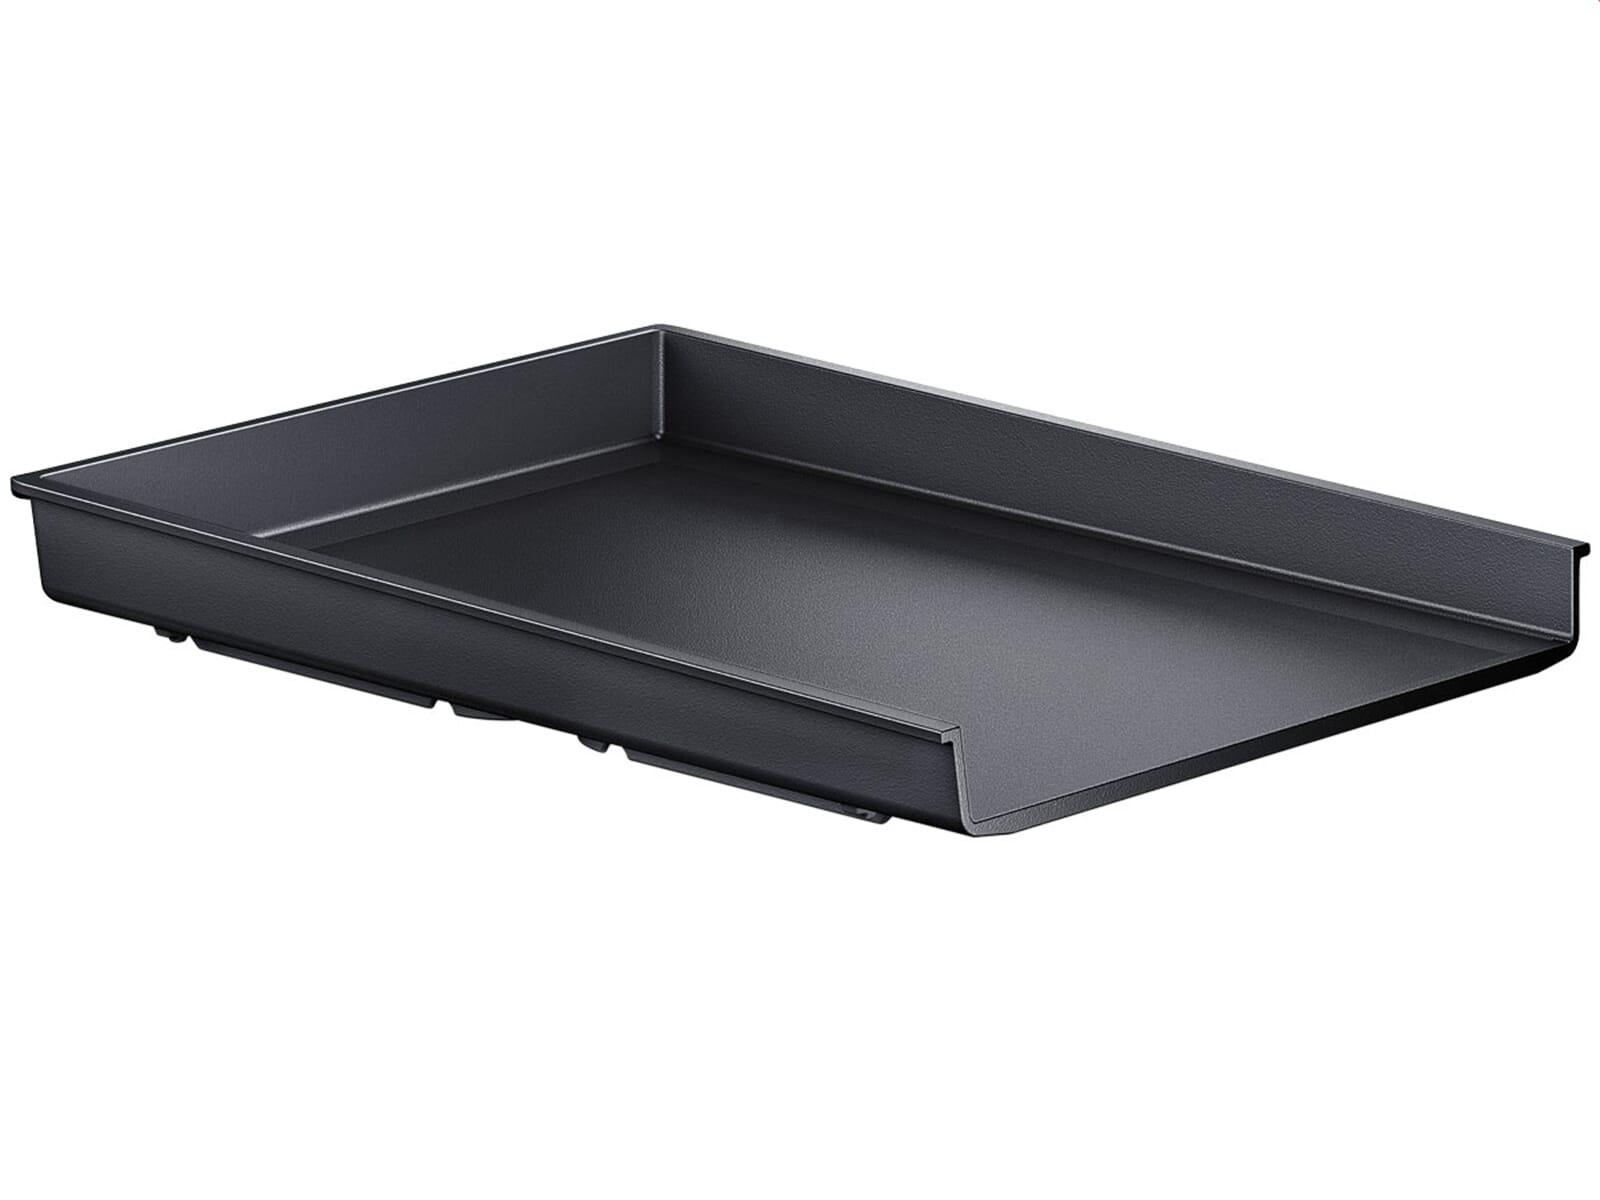 gaggenau va 461 001 gusspfanne emailliert. Black Bedroom Furniture Sets. Home Design Ideas